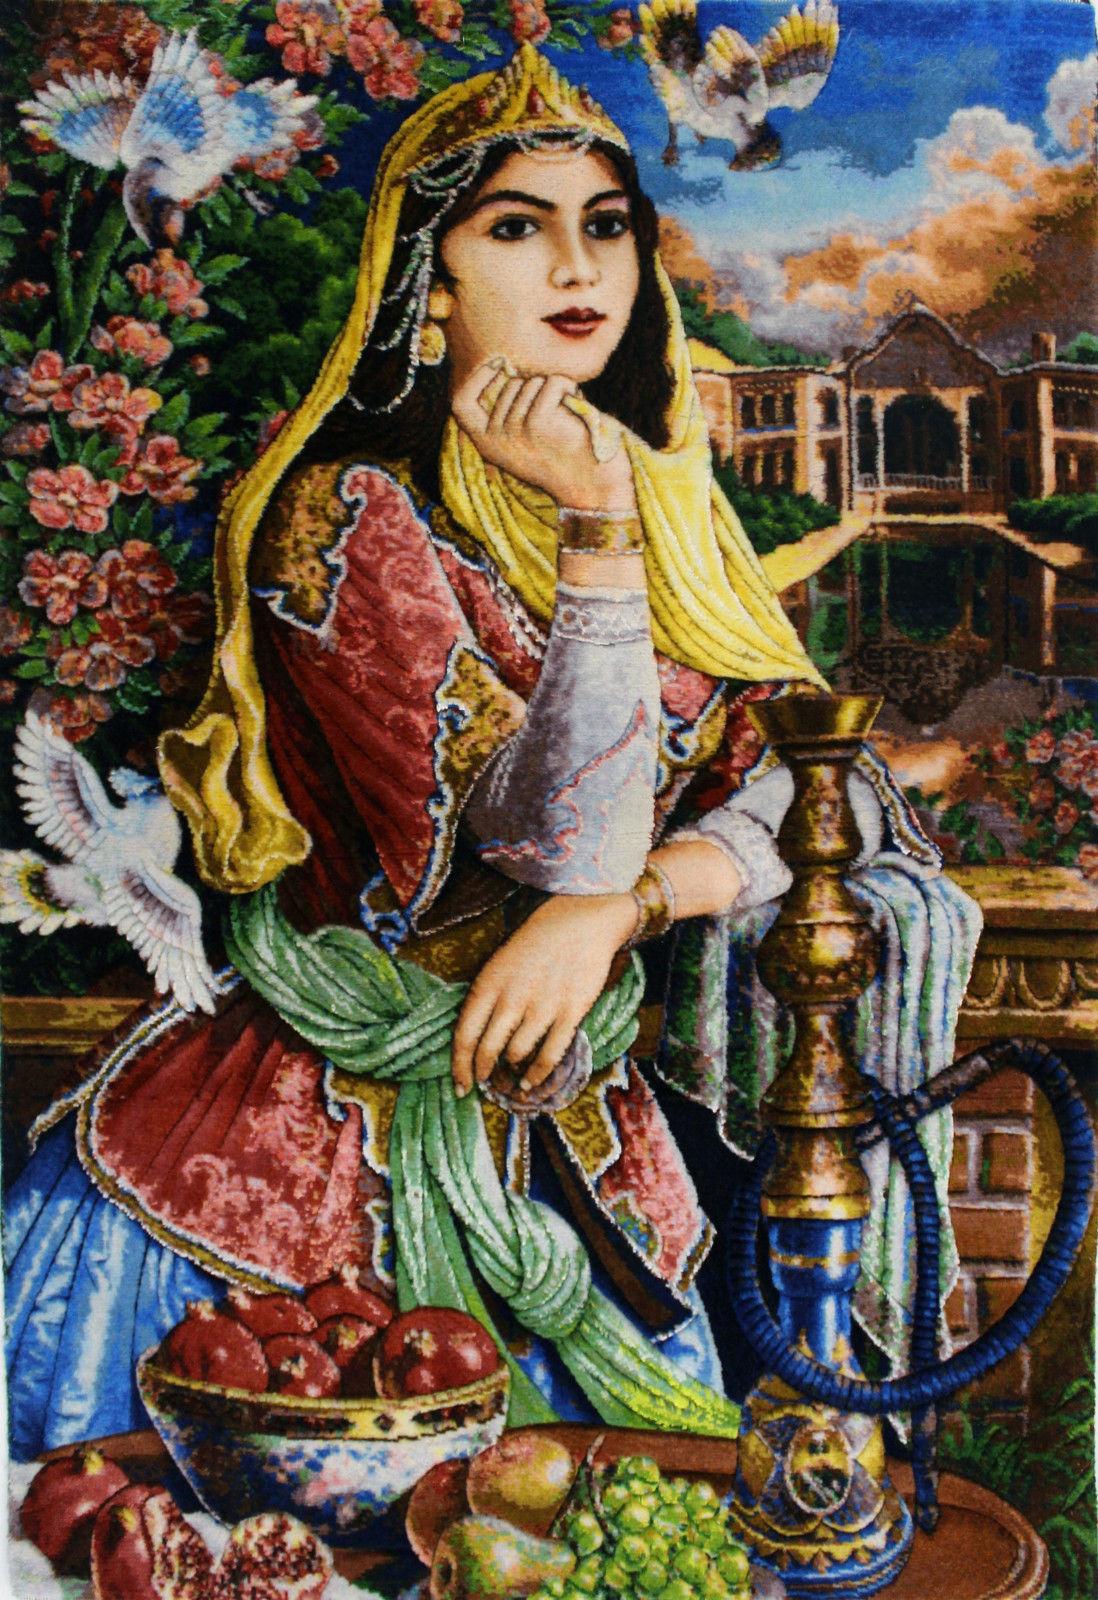 2'2″W x 2'10″H Handmade Wool and Silk QAJAR GIRL Persian Tableau Rug Tapestry Wall Hanging 12980824